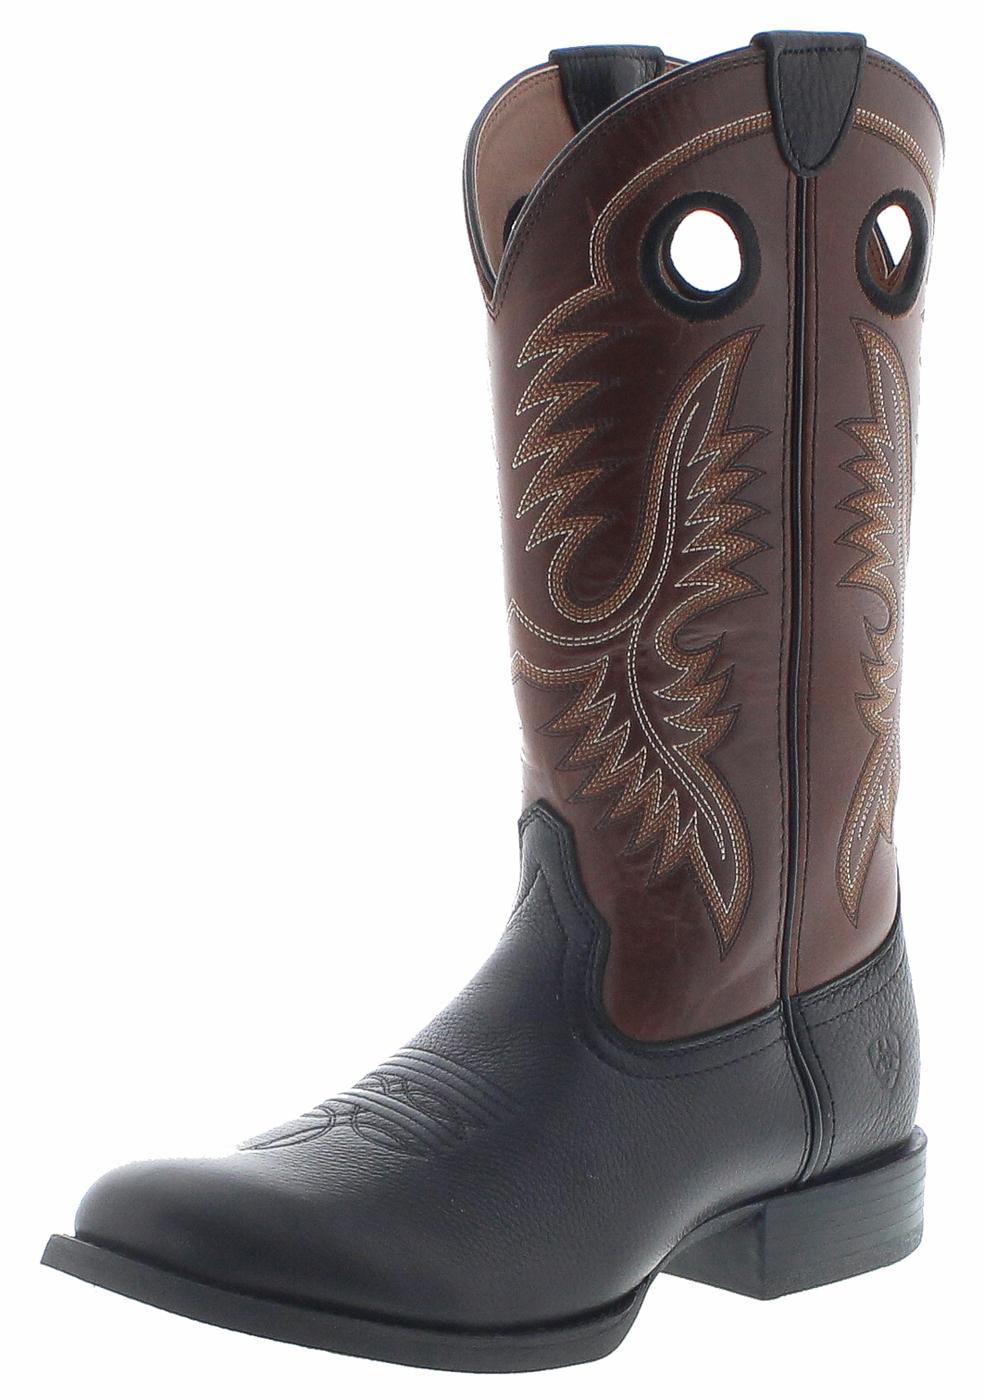 ARIAT 27217 SPORT BIG HOSS Brown Mayan Western riding boots - black